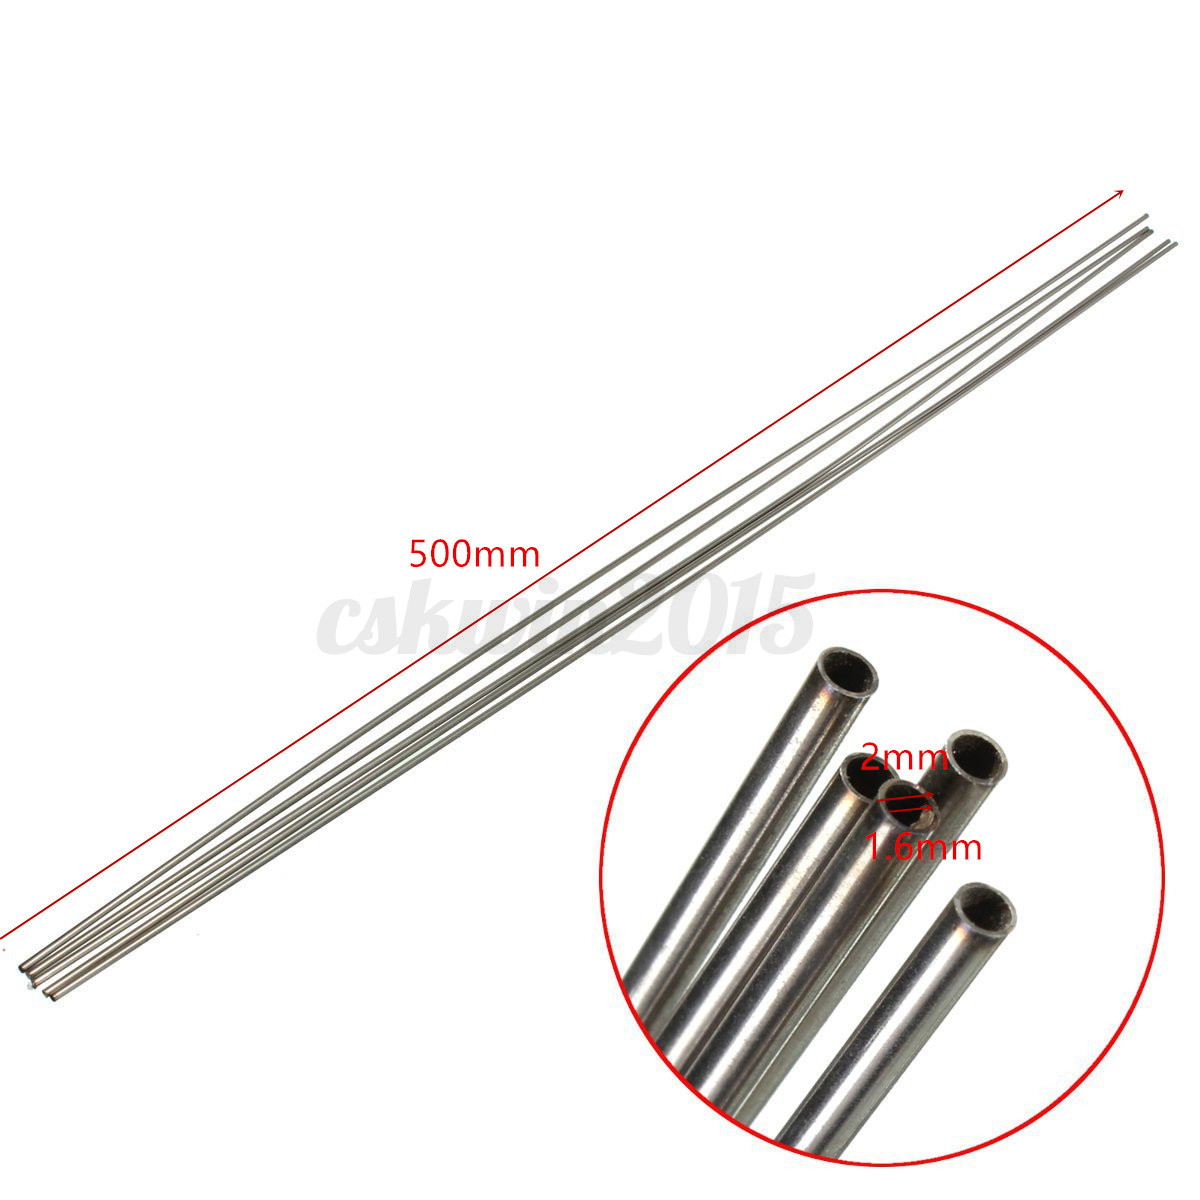 Pcs stainless steel capillary tube rod tool mm